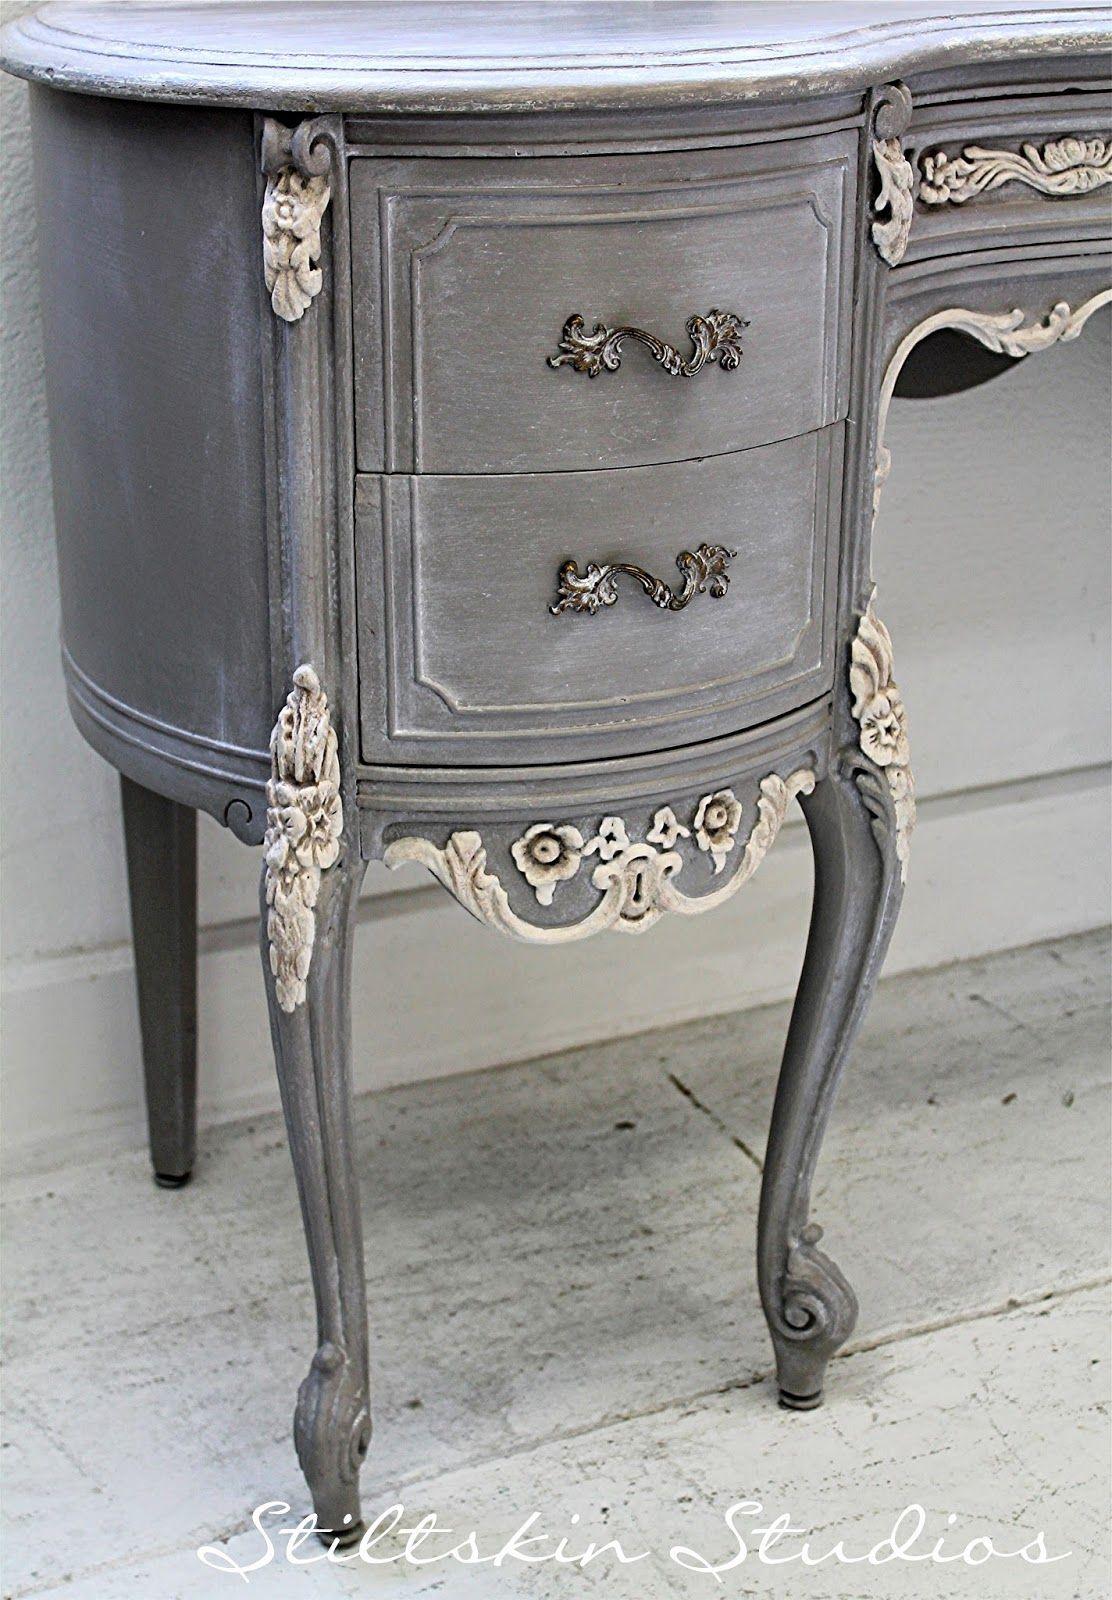 grey painted chairs revolving chair repair in jaipur stiltskin studios weathered french desk always love